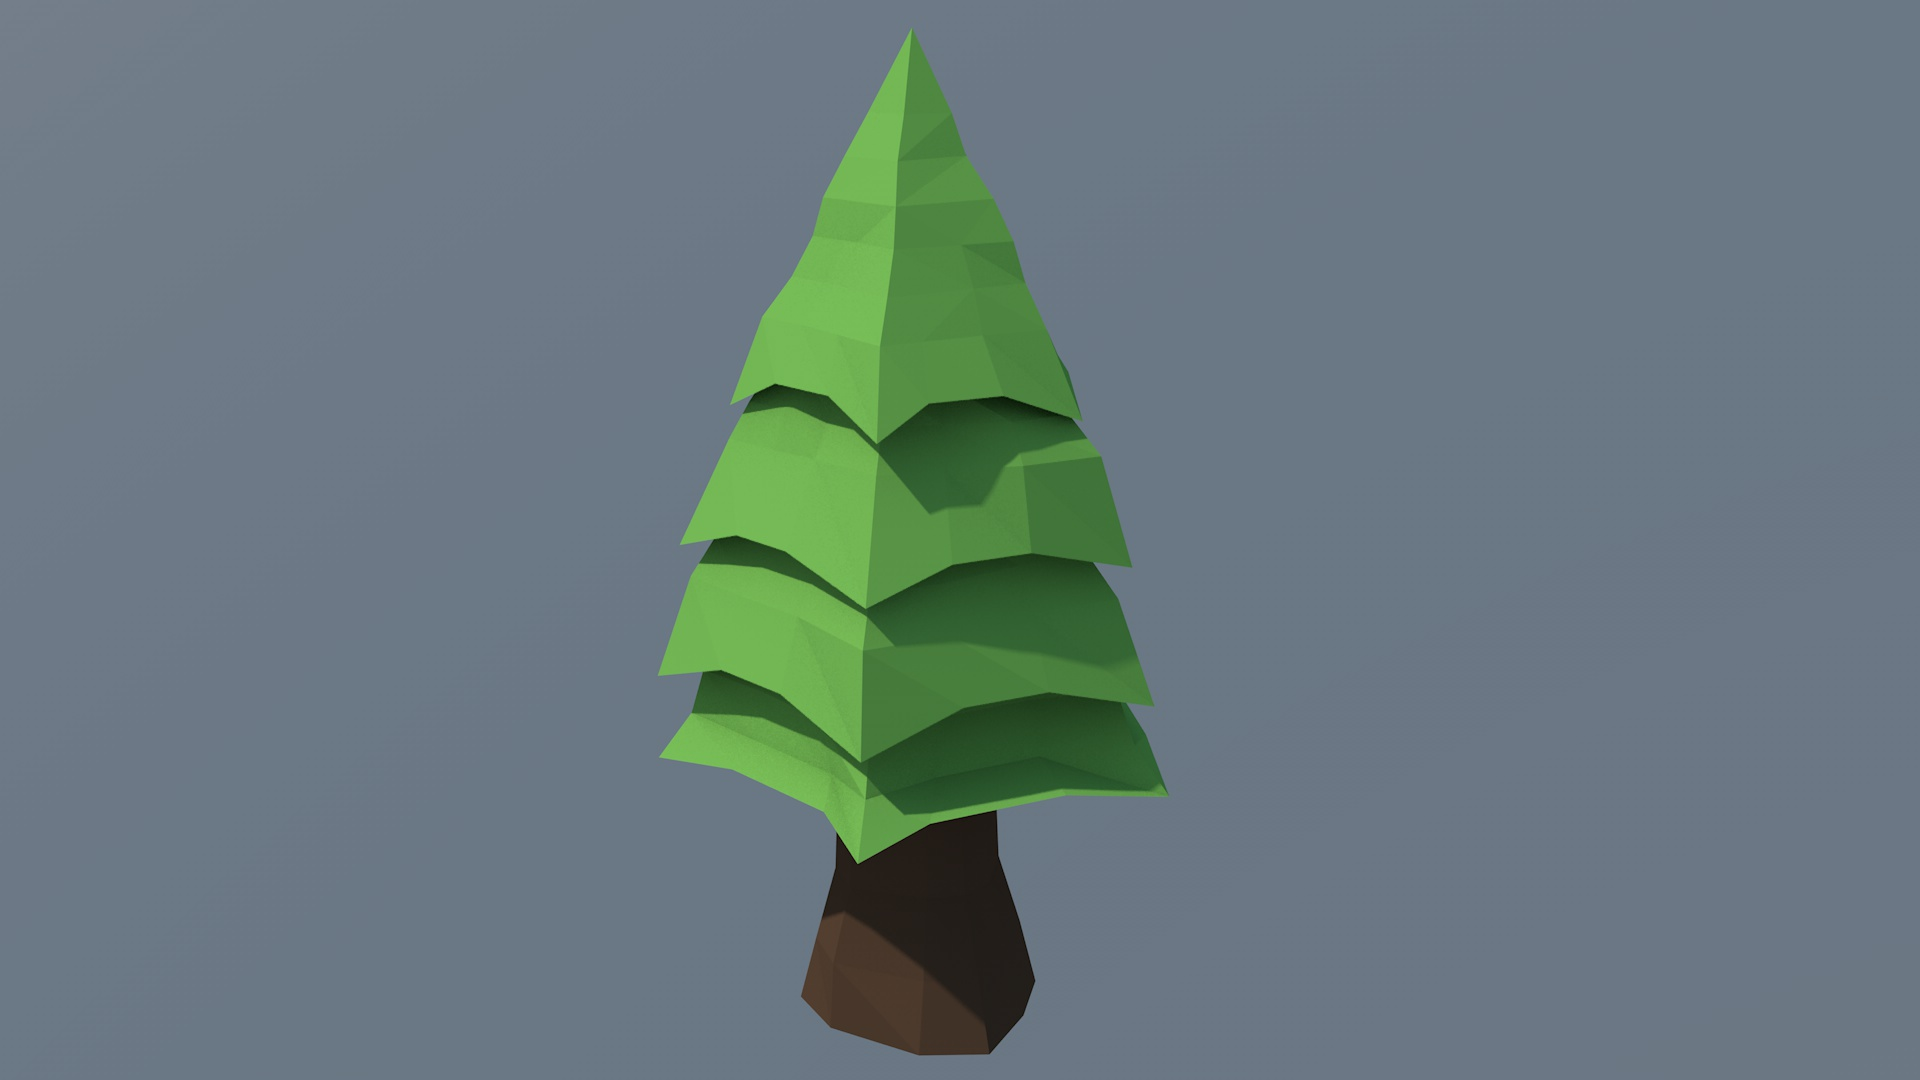 Classy new pine tree!